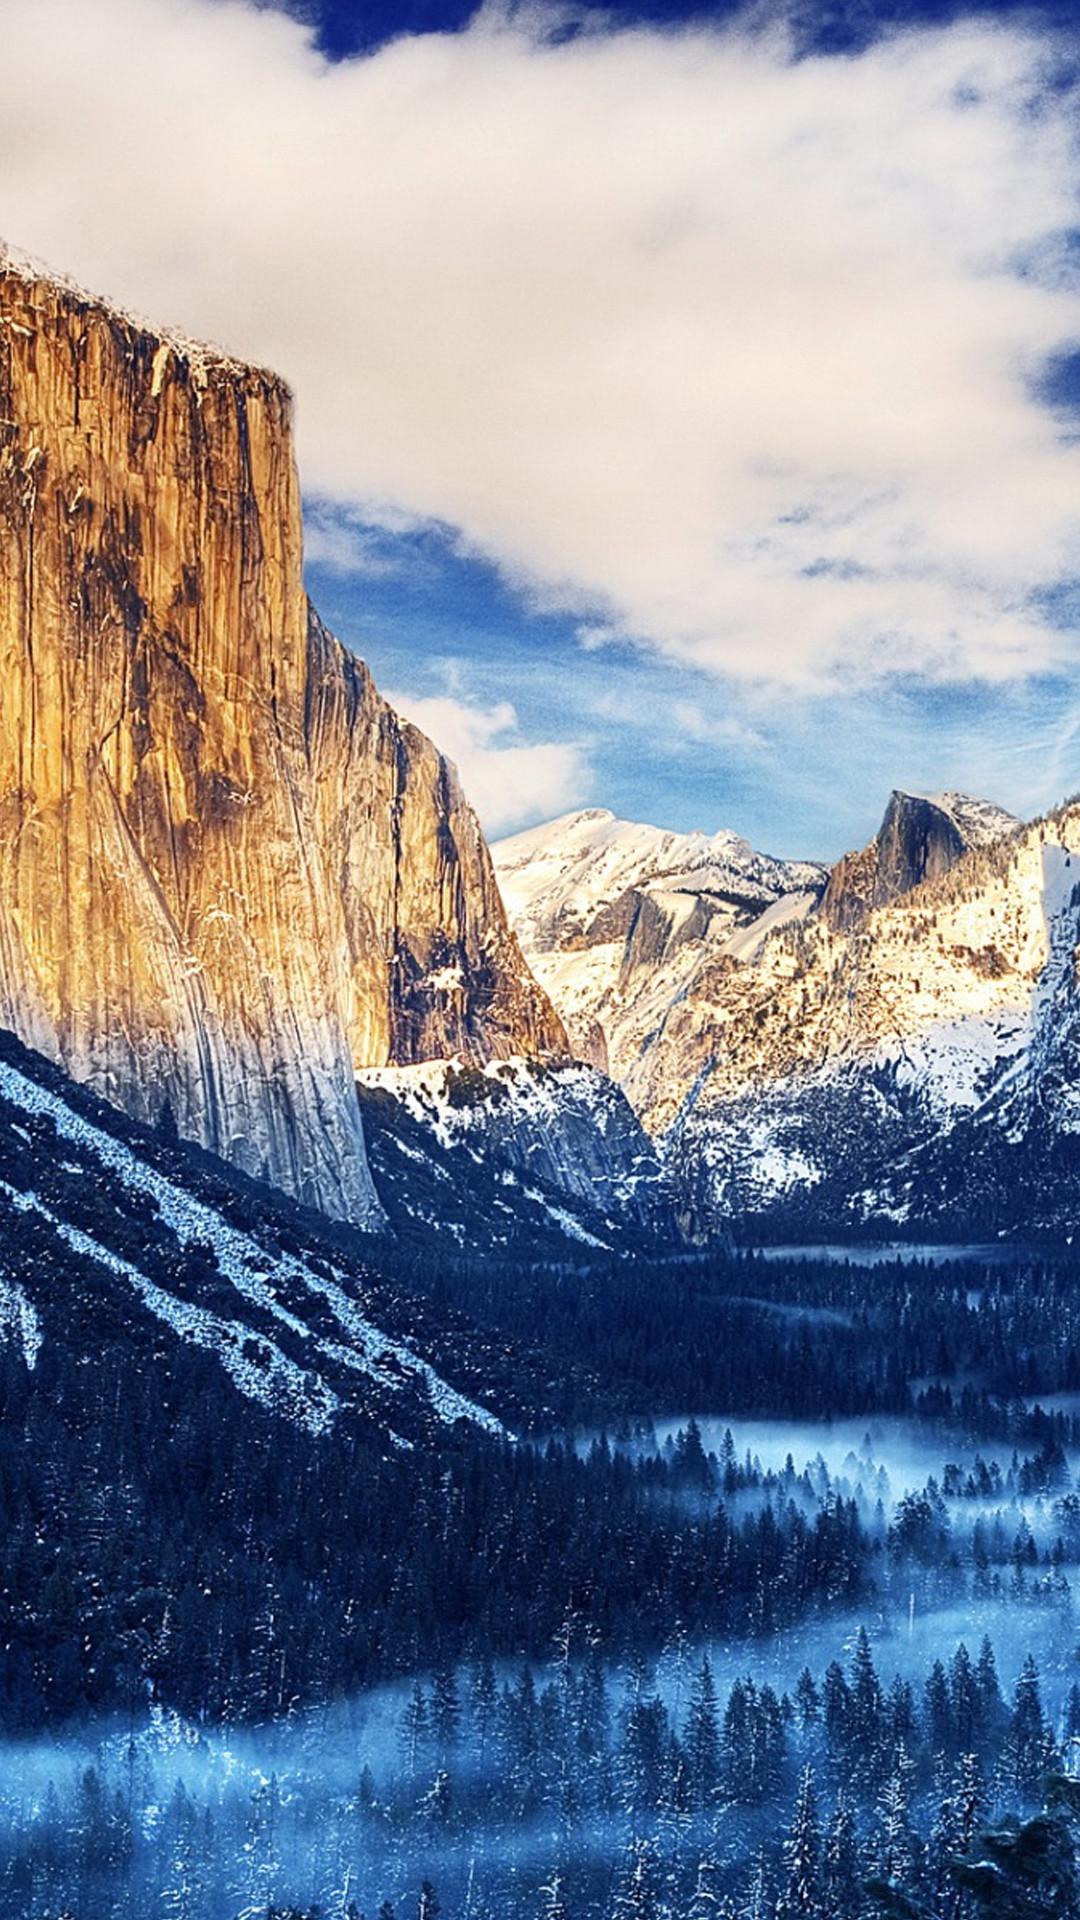 Yosemite National Park Winter Landscape iPhone 6 Plus HD Wallpaper